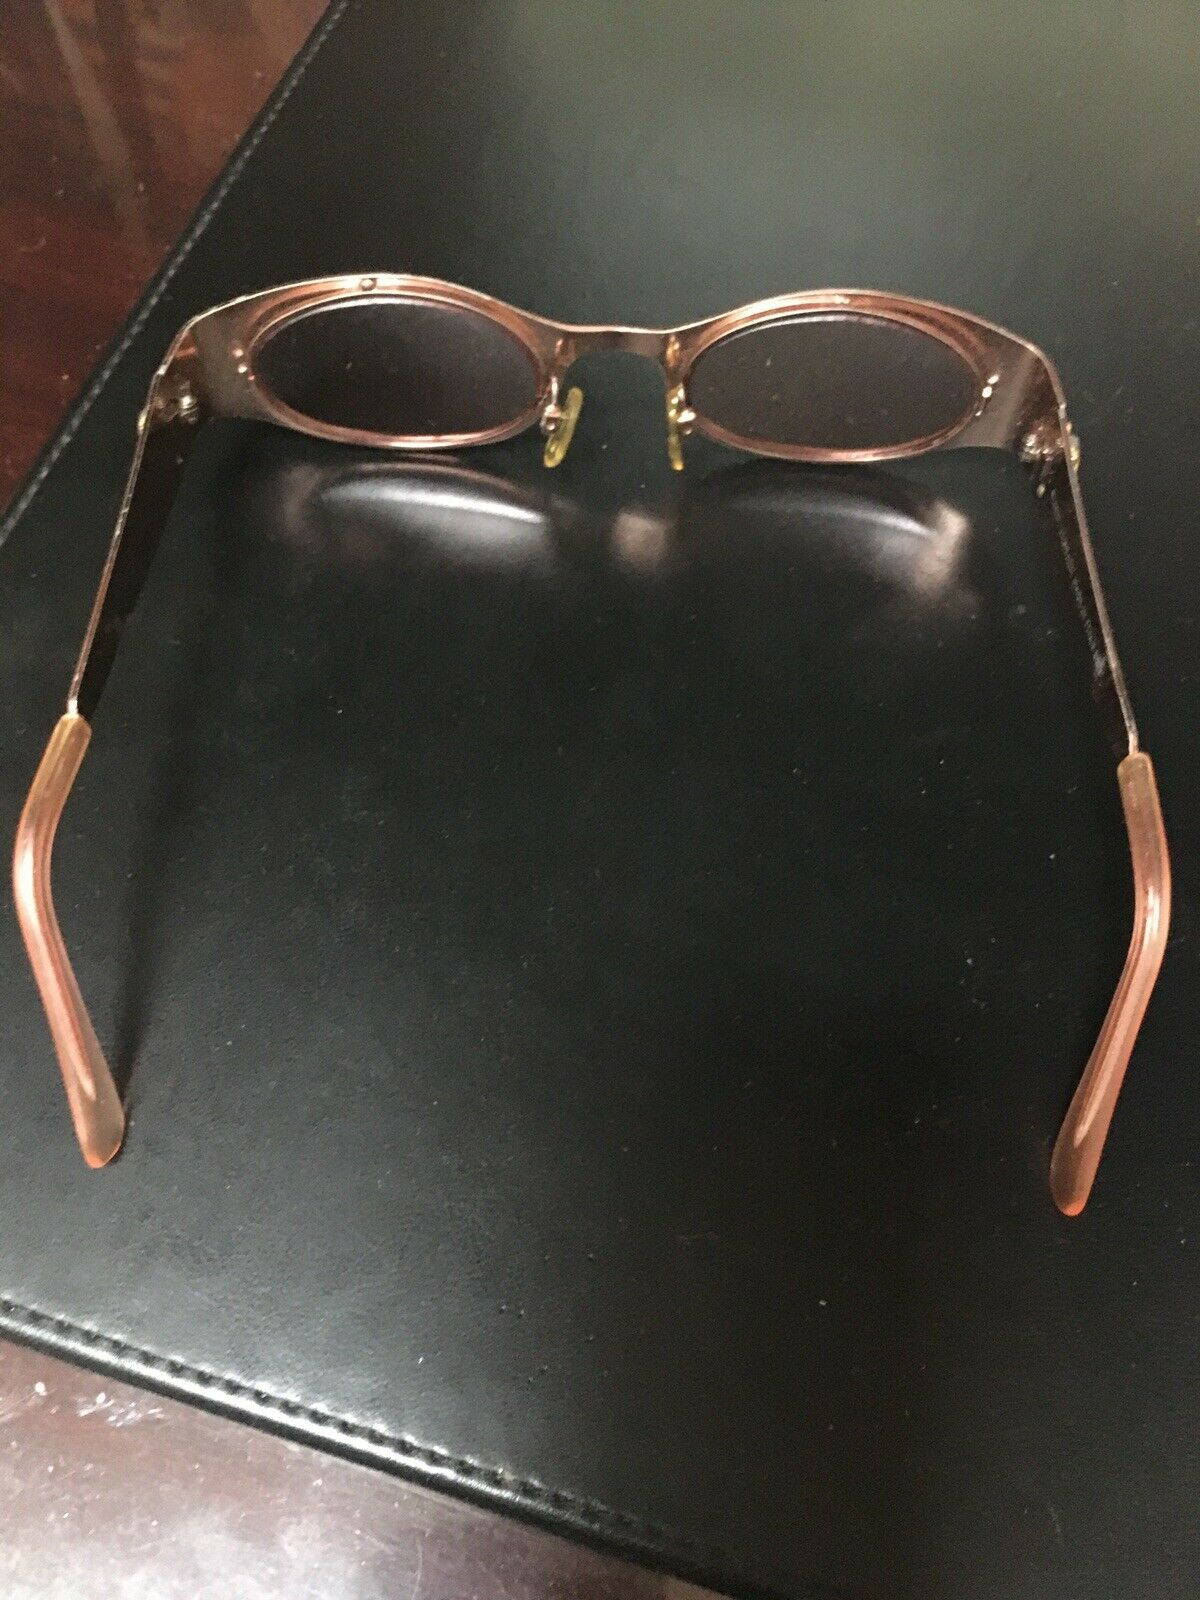 Gianni Versace VINTAGE Italy Sunglasses VERY GOOD… - image 2